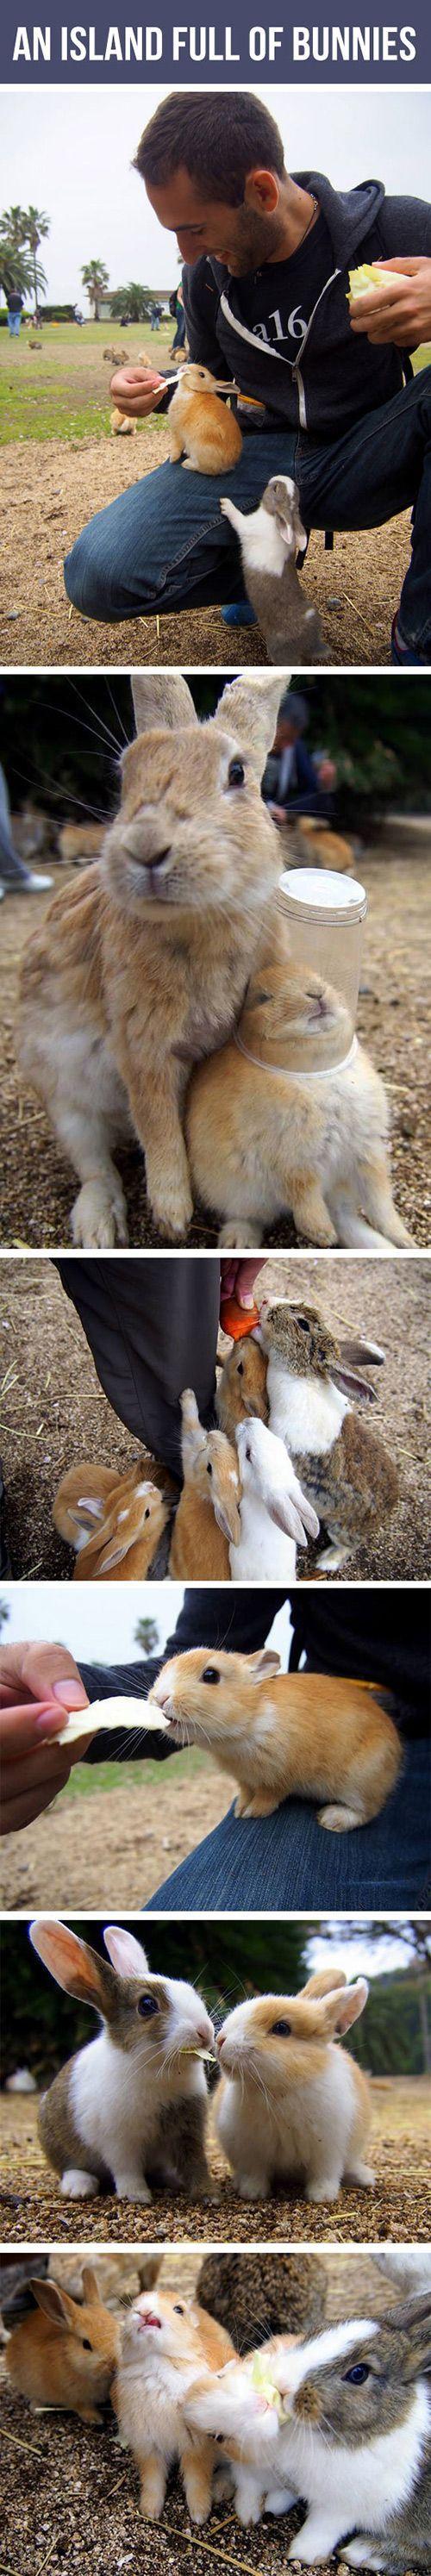 best 25 rabbit breeds ideas on pinterest breeds of rabbits